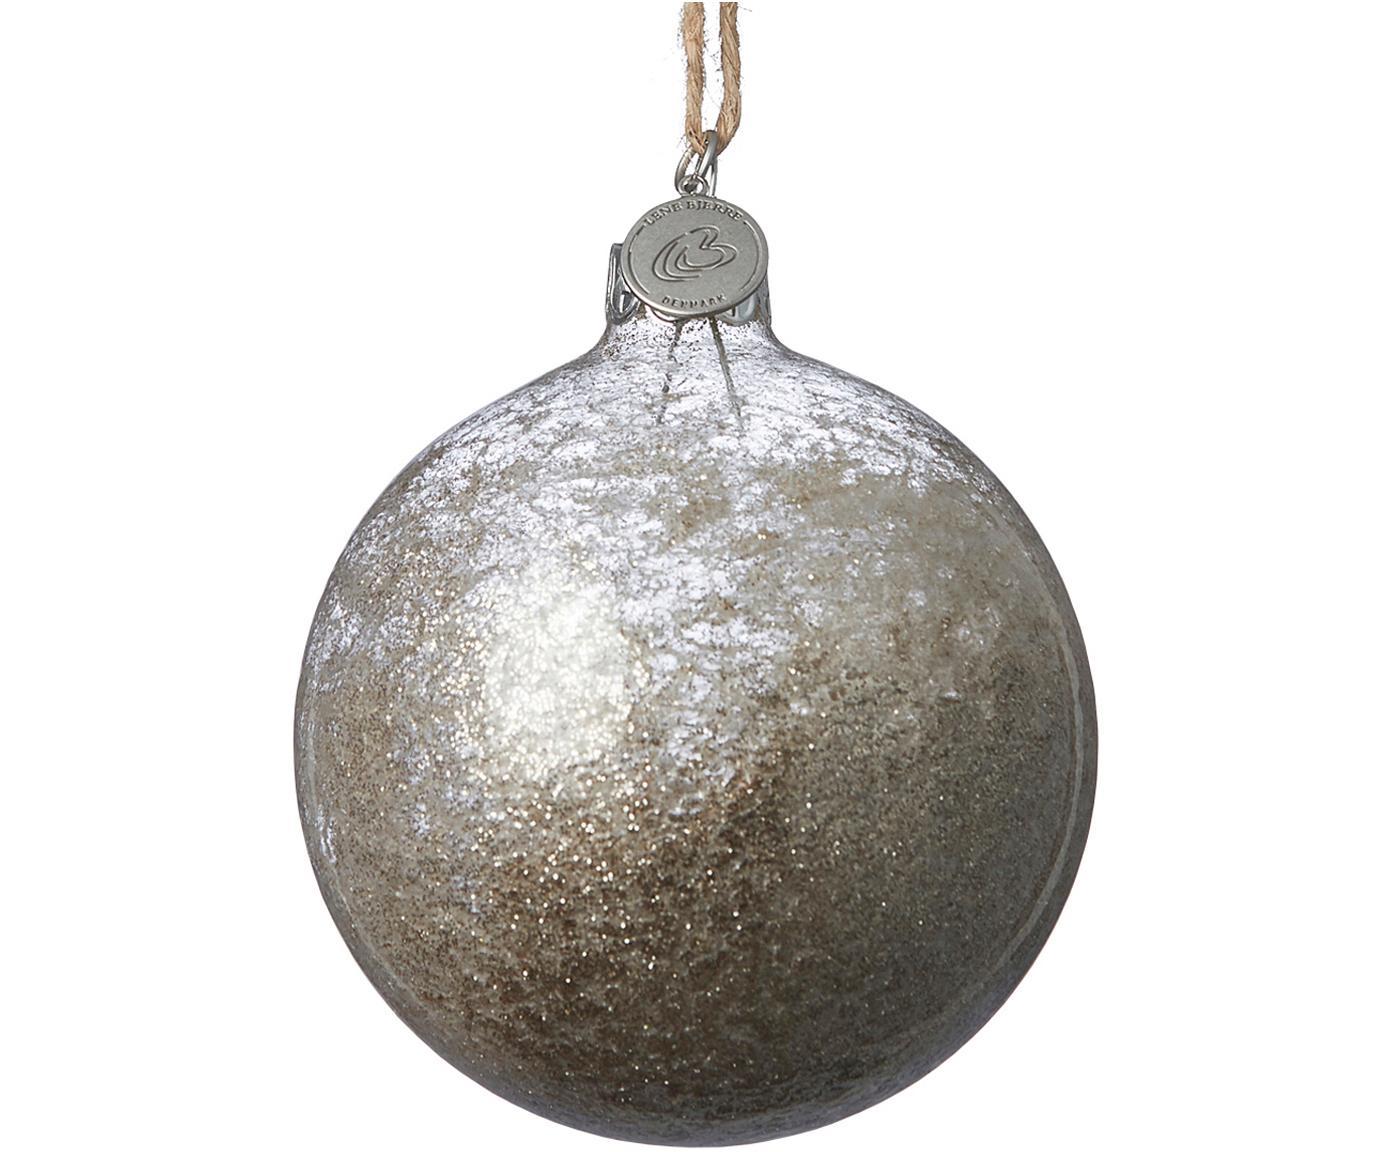 Weihnachtskugeln Velma Ø8cm, 2Stück, Goldfarben, Transparent, Ø 8 cm